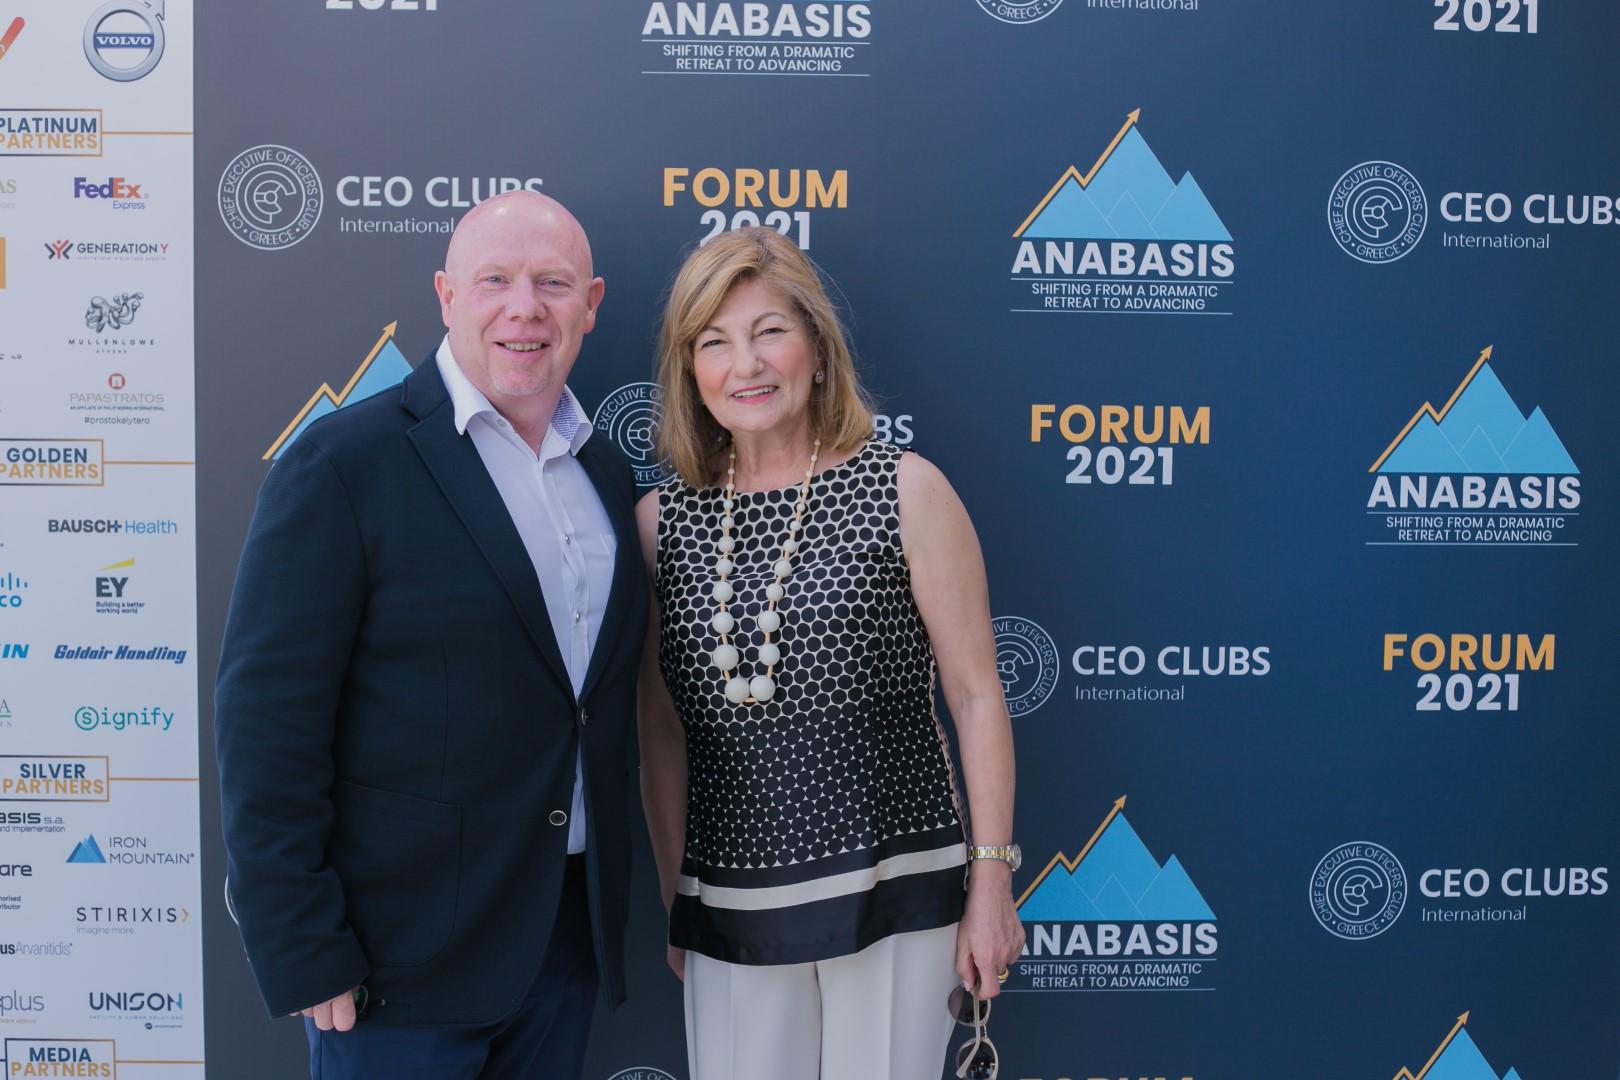 CEO Clubs Greece Forum: Οι CEOs ηγούνται της ανάβασης πέρα από την κρίση